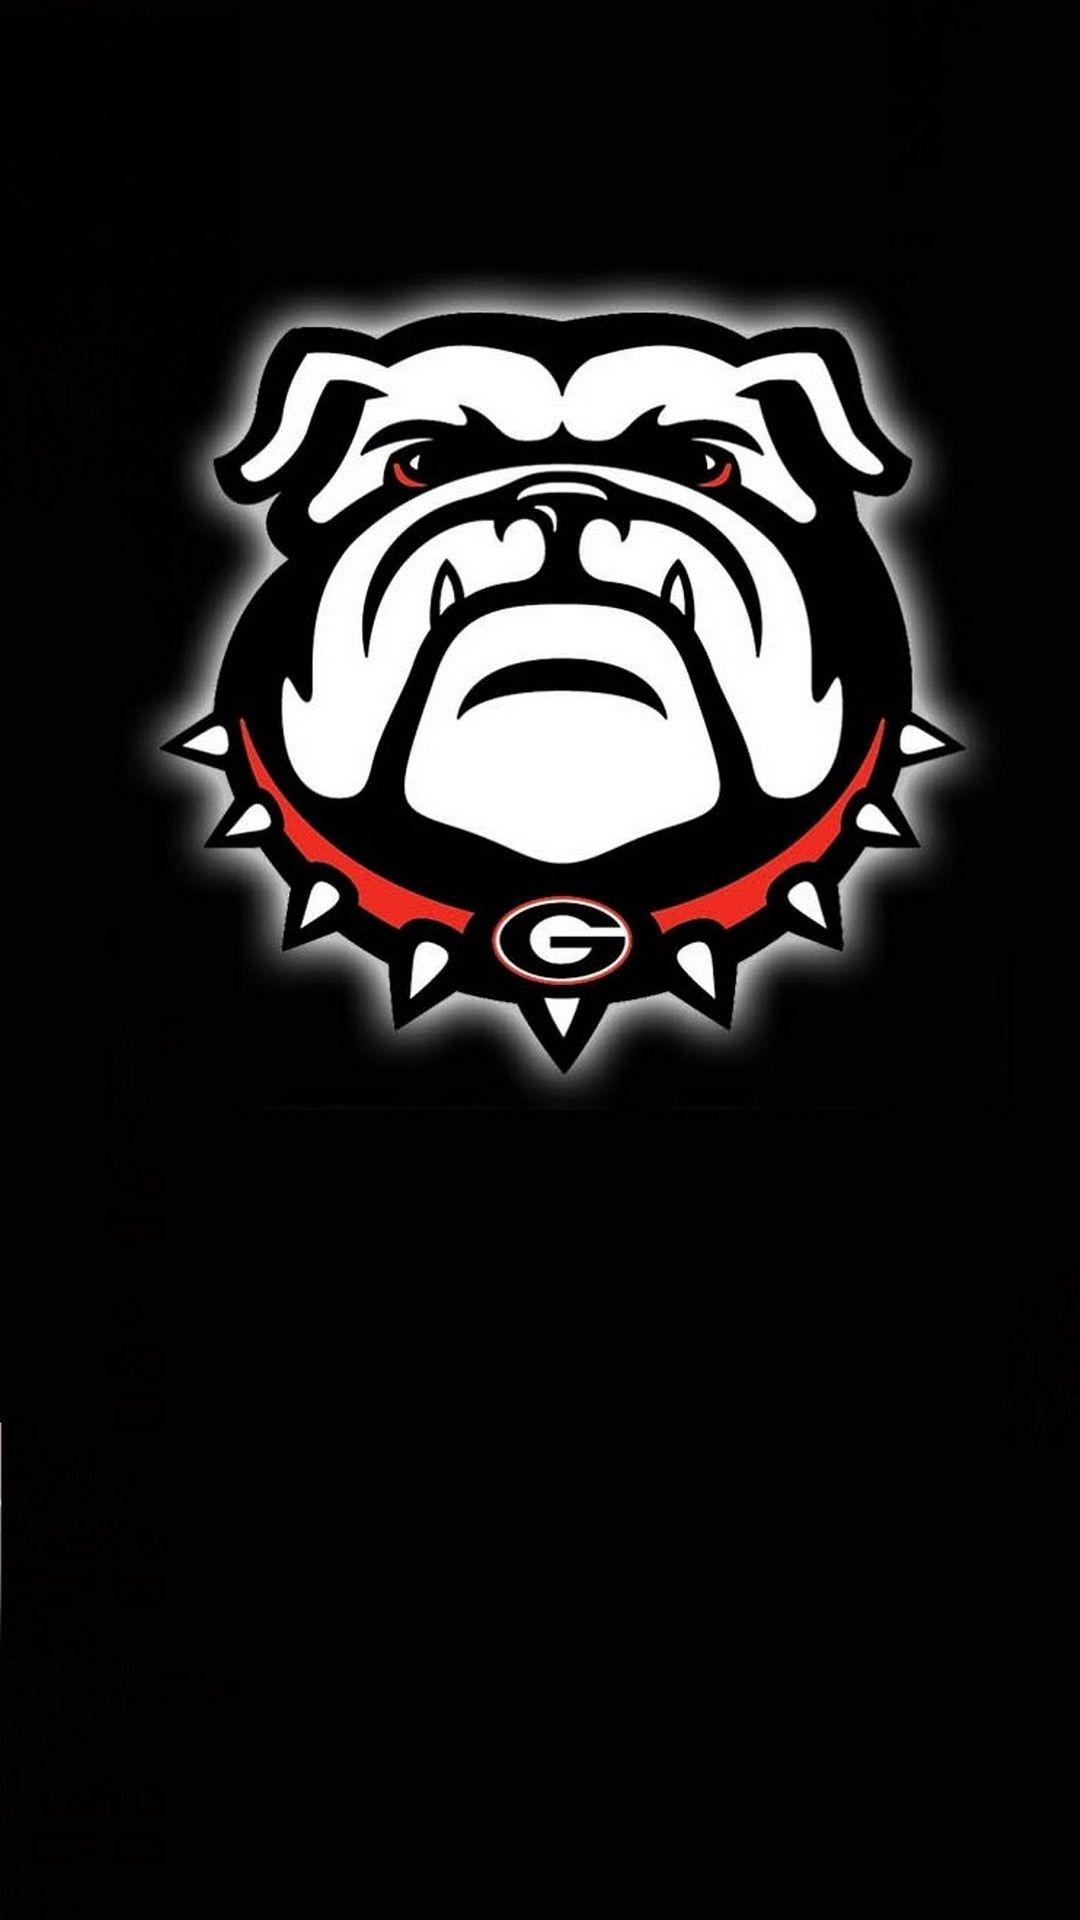 Wallpaper Georgia Bulldogs iPhone - Best iPhone Wallpaper ...